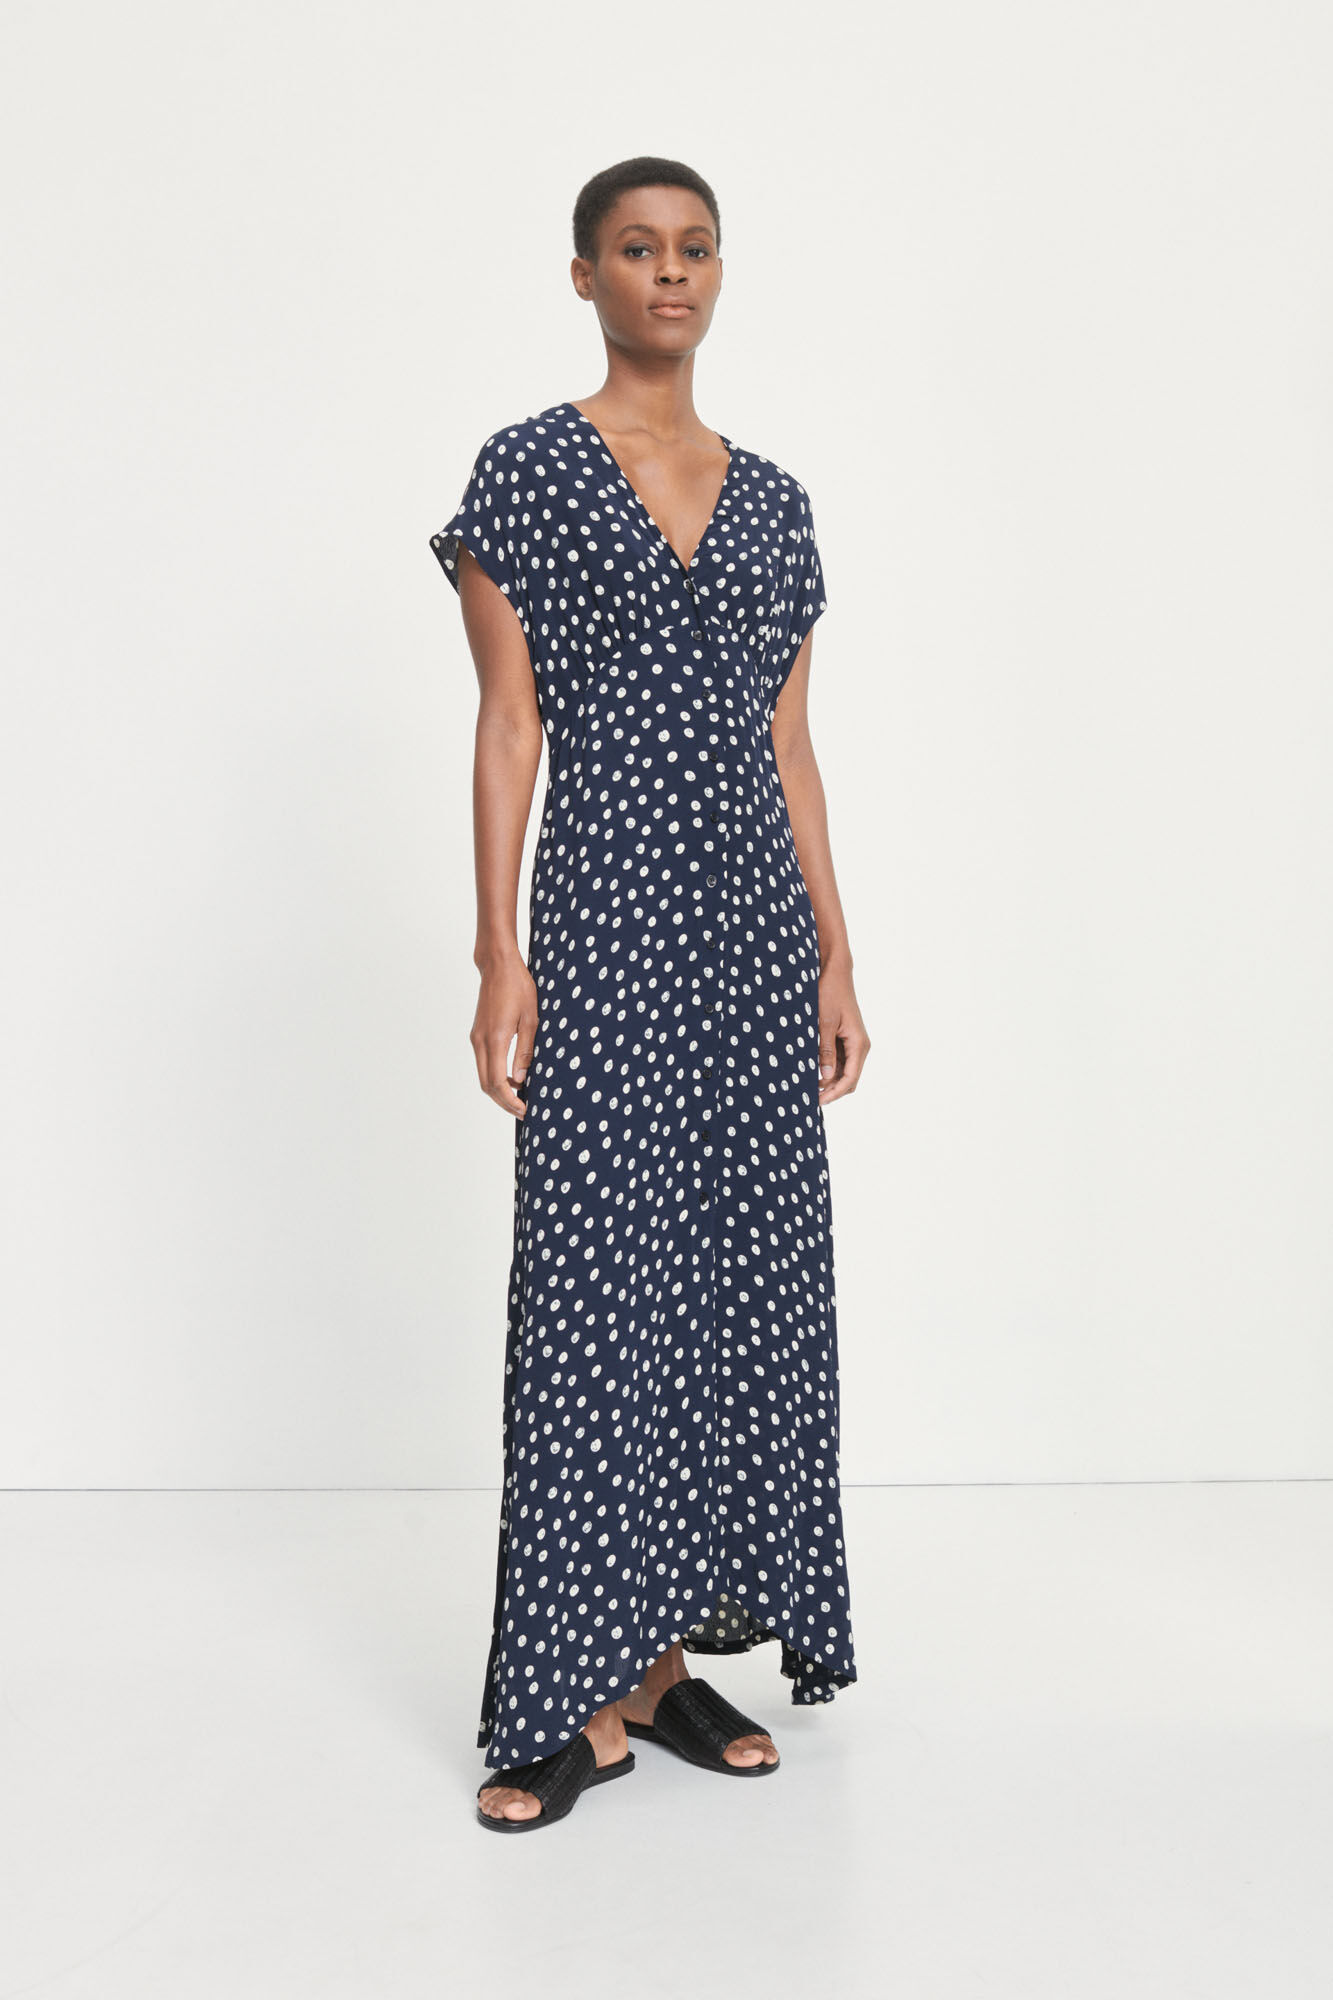 Valerie long dress aop 10867, BLUE DOODLE DOT